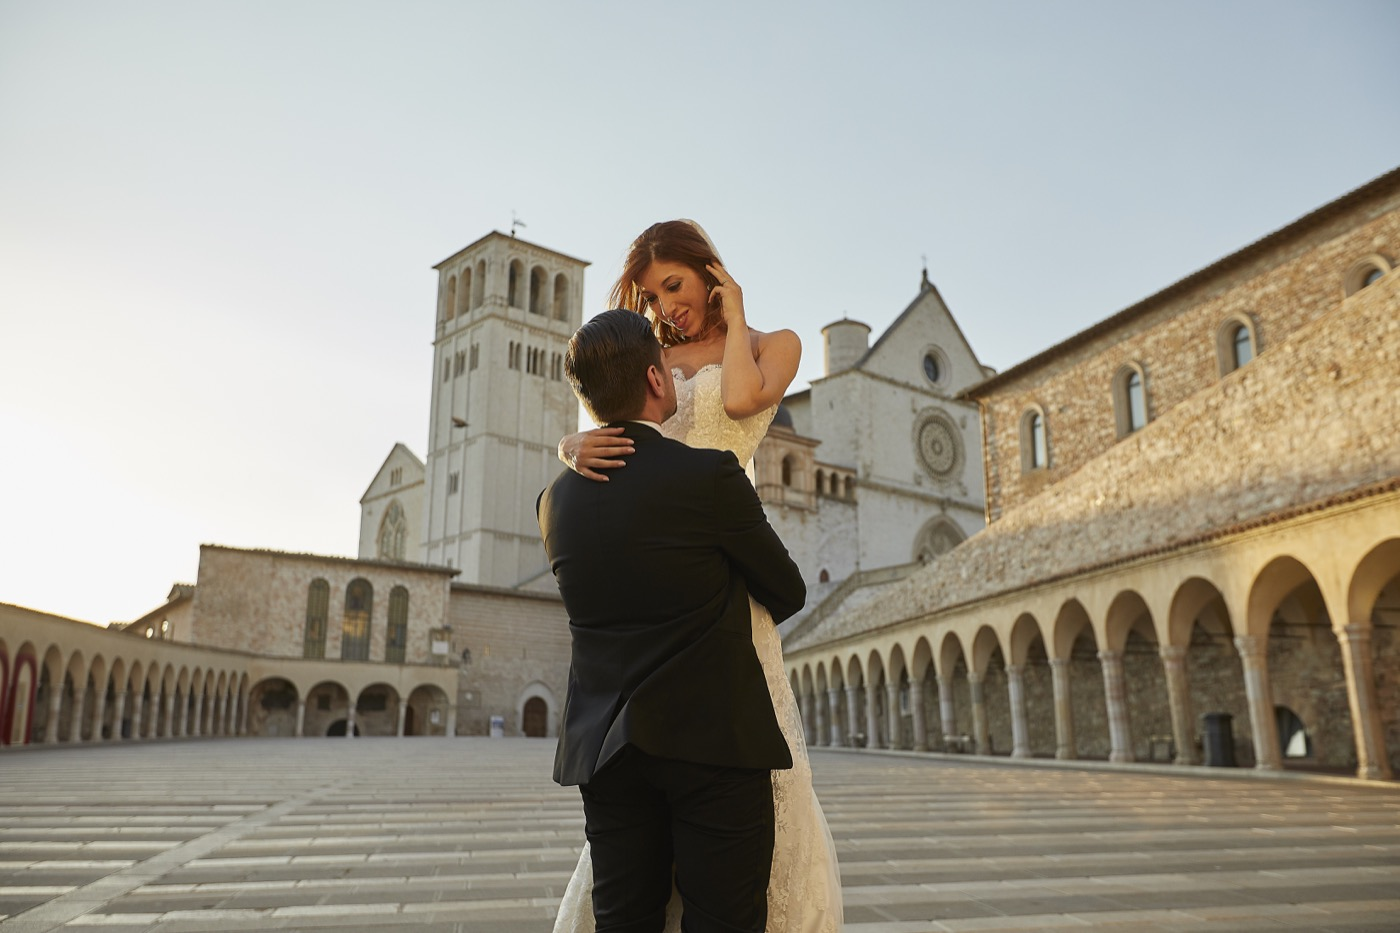 Claudio-Coppola-wedding-photographer-abbazia-7-frati-piegaro-73